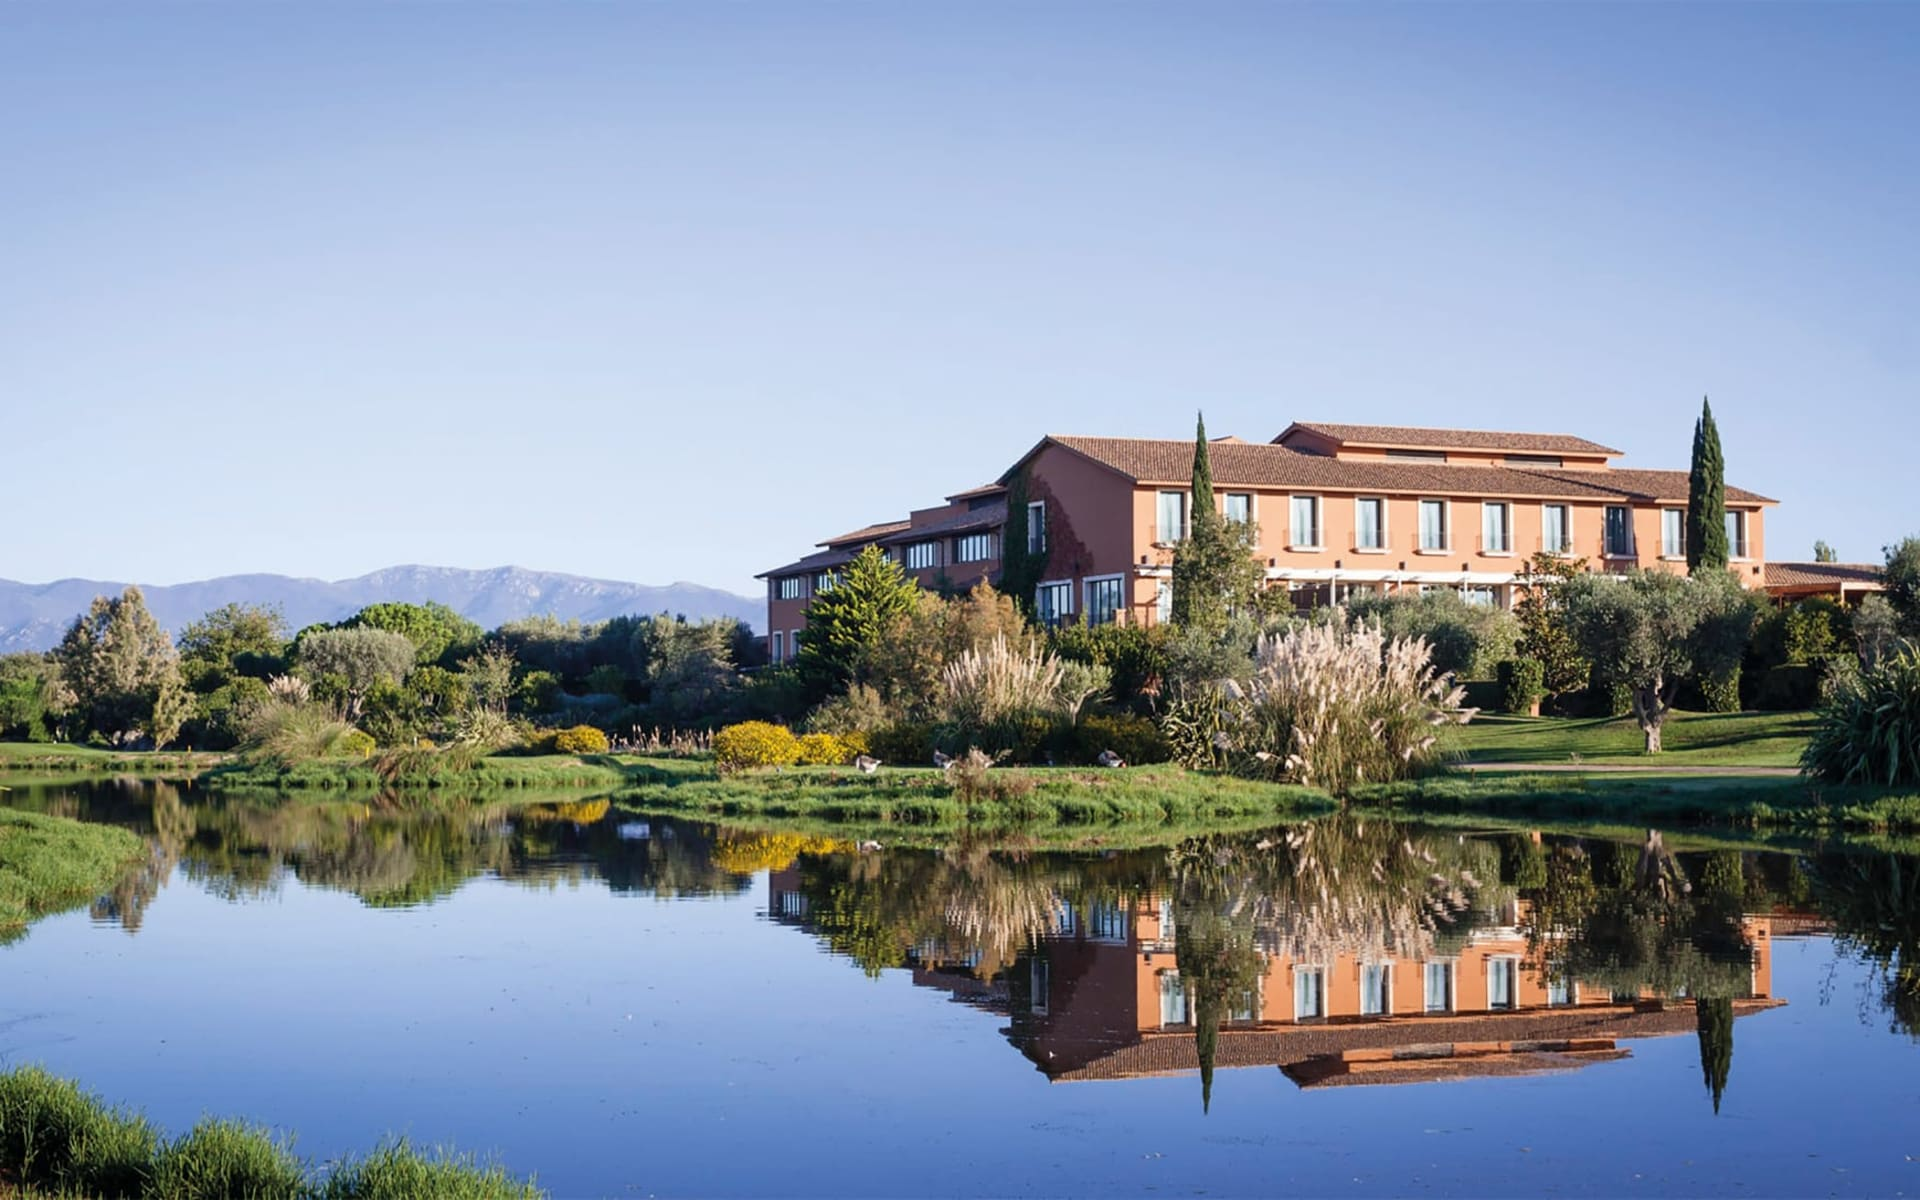 16.10. - 23.10.2021 Golf Trainingswoche an der Costa Brava ab Barcelona: Peralada Resort